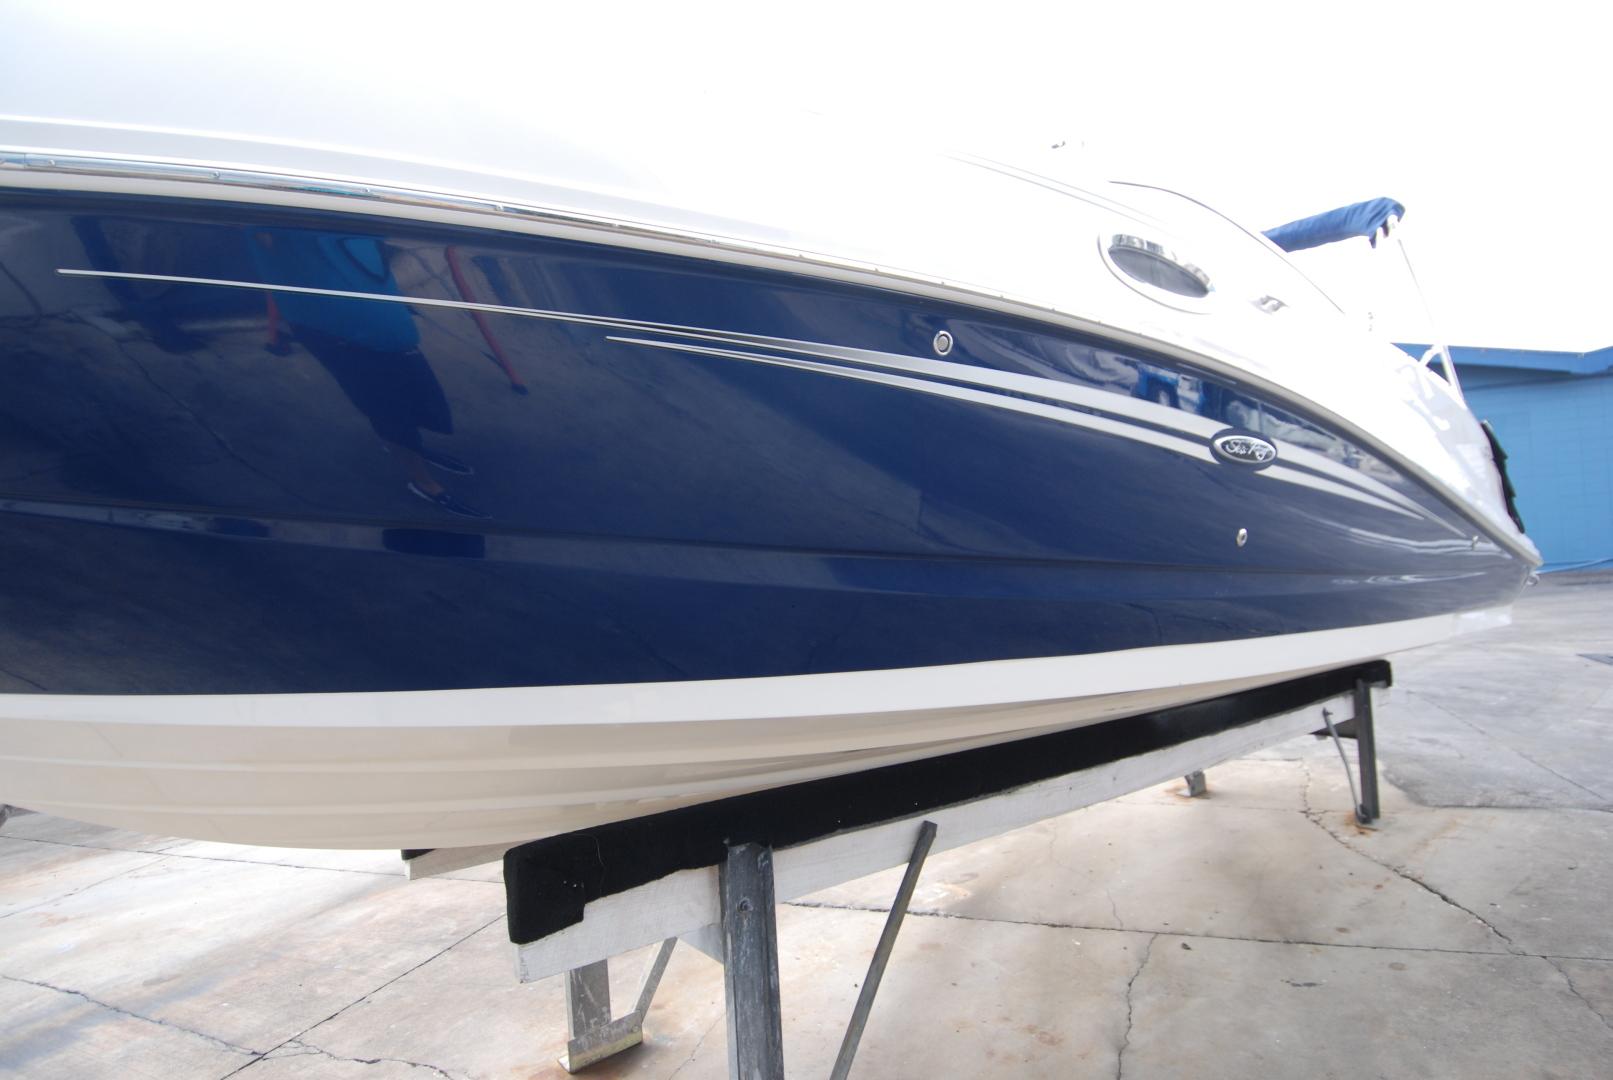 Sea Ray-Sundeck 2008-Absolute Escape Palm Harbor-Florida-United States-1566234 | Thumbnail